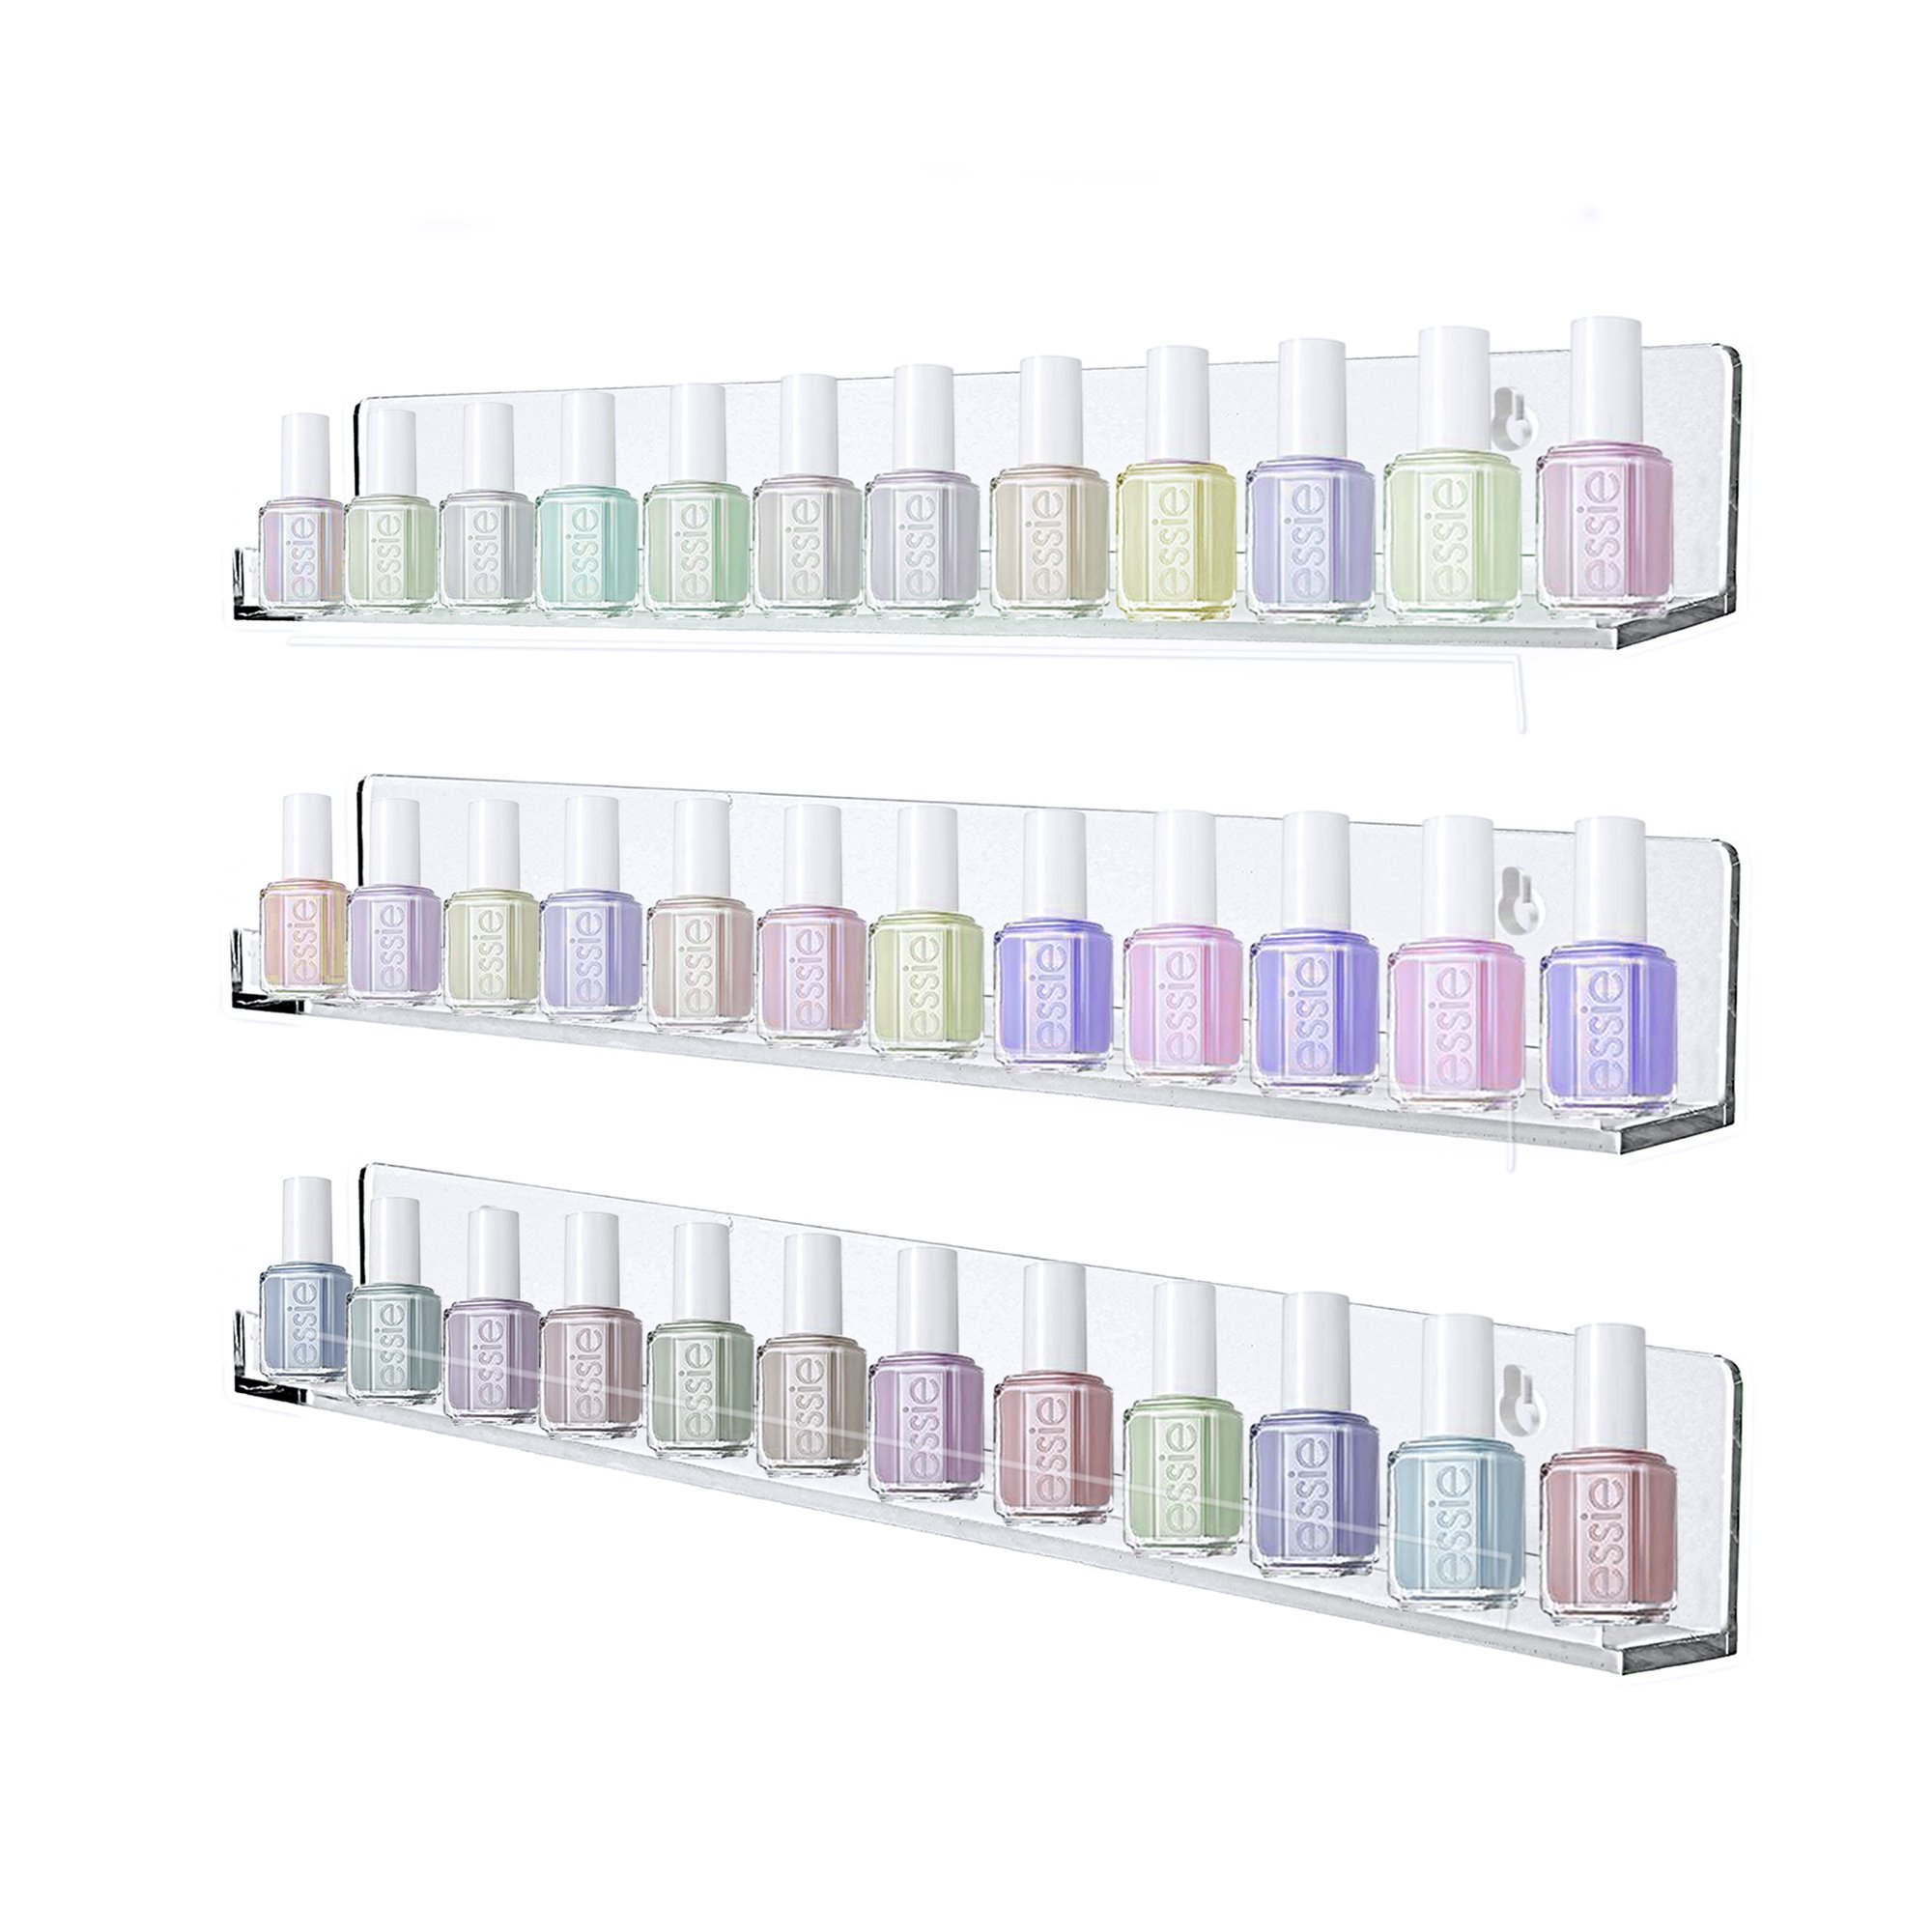 Aifaifa Acrylic Floating Shelf Nail Polish, Lipstick, Essential Oil, Cosmetic Displaying Storage, Set of 3 Shelves Holds up to 45 Bottles Nail Polish